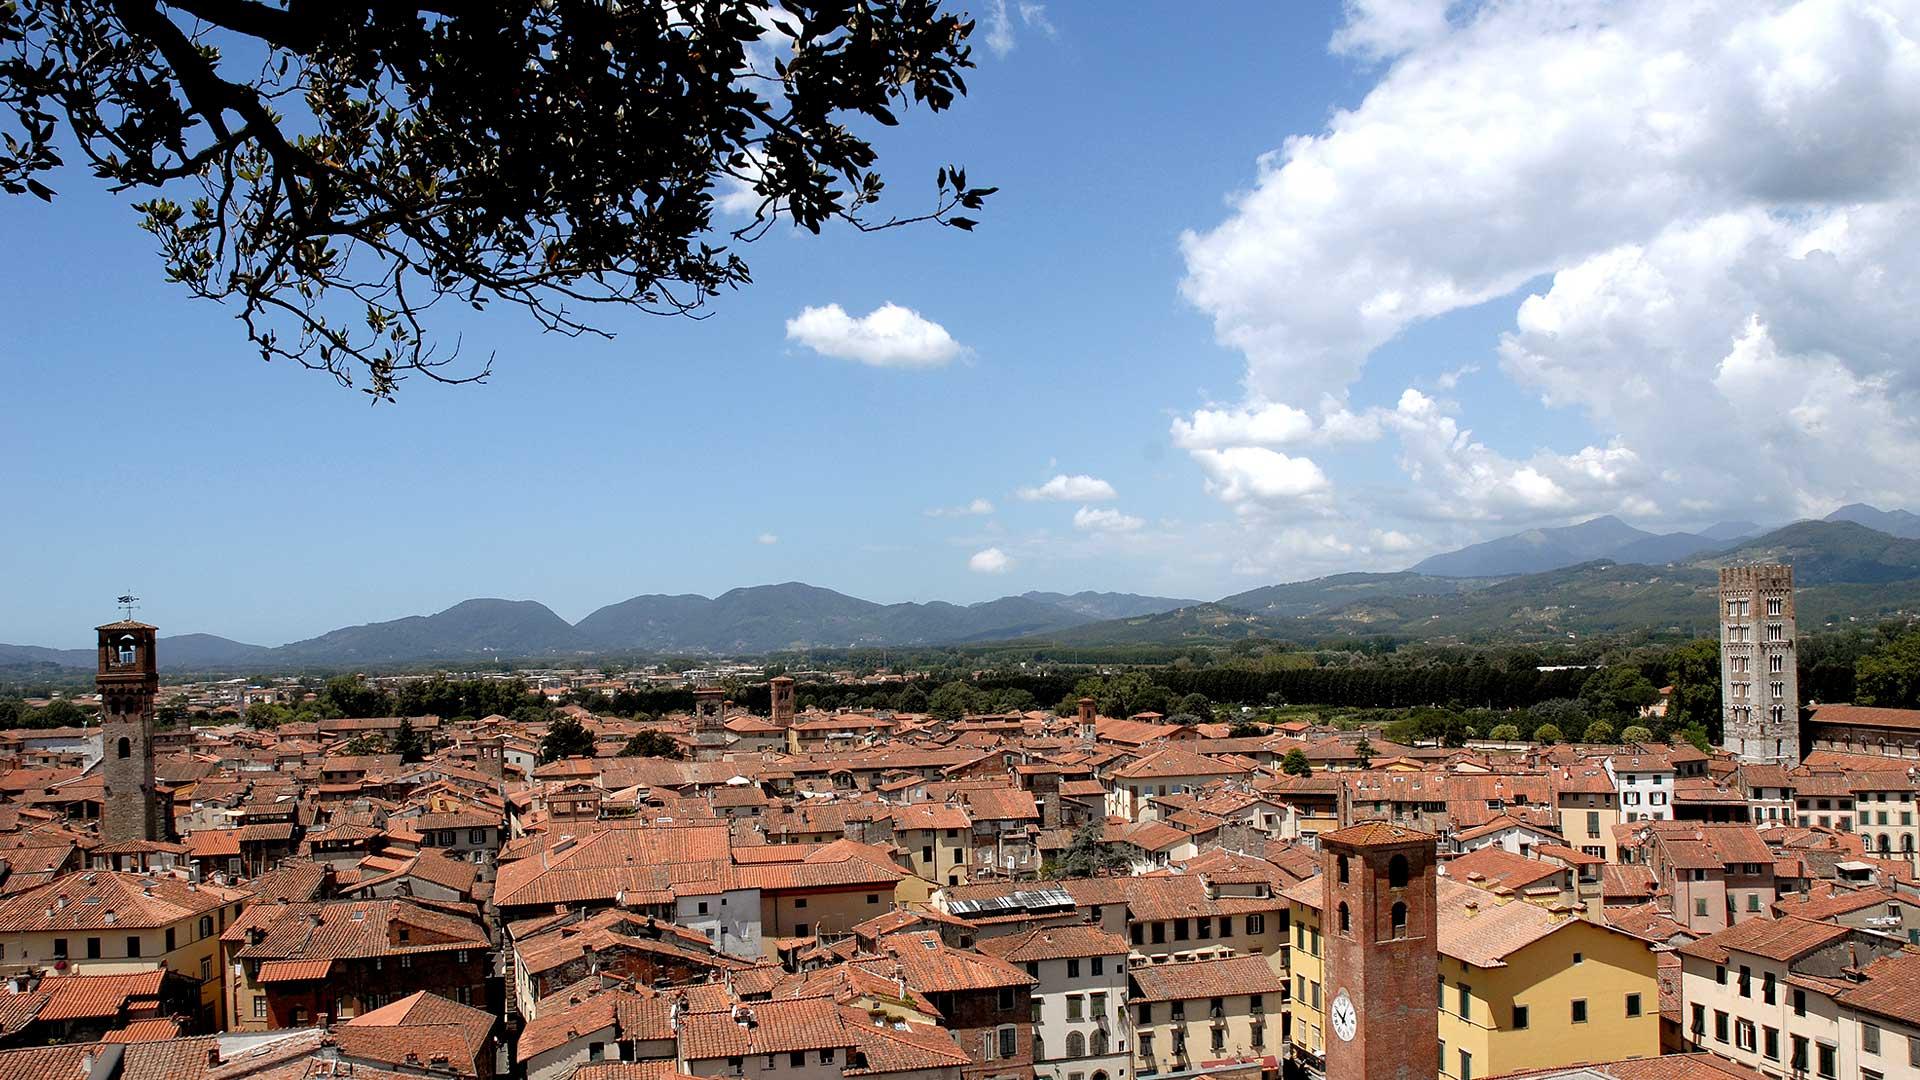 Foto territorio Lucca bed and breakfast locanda francigena lucca